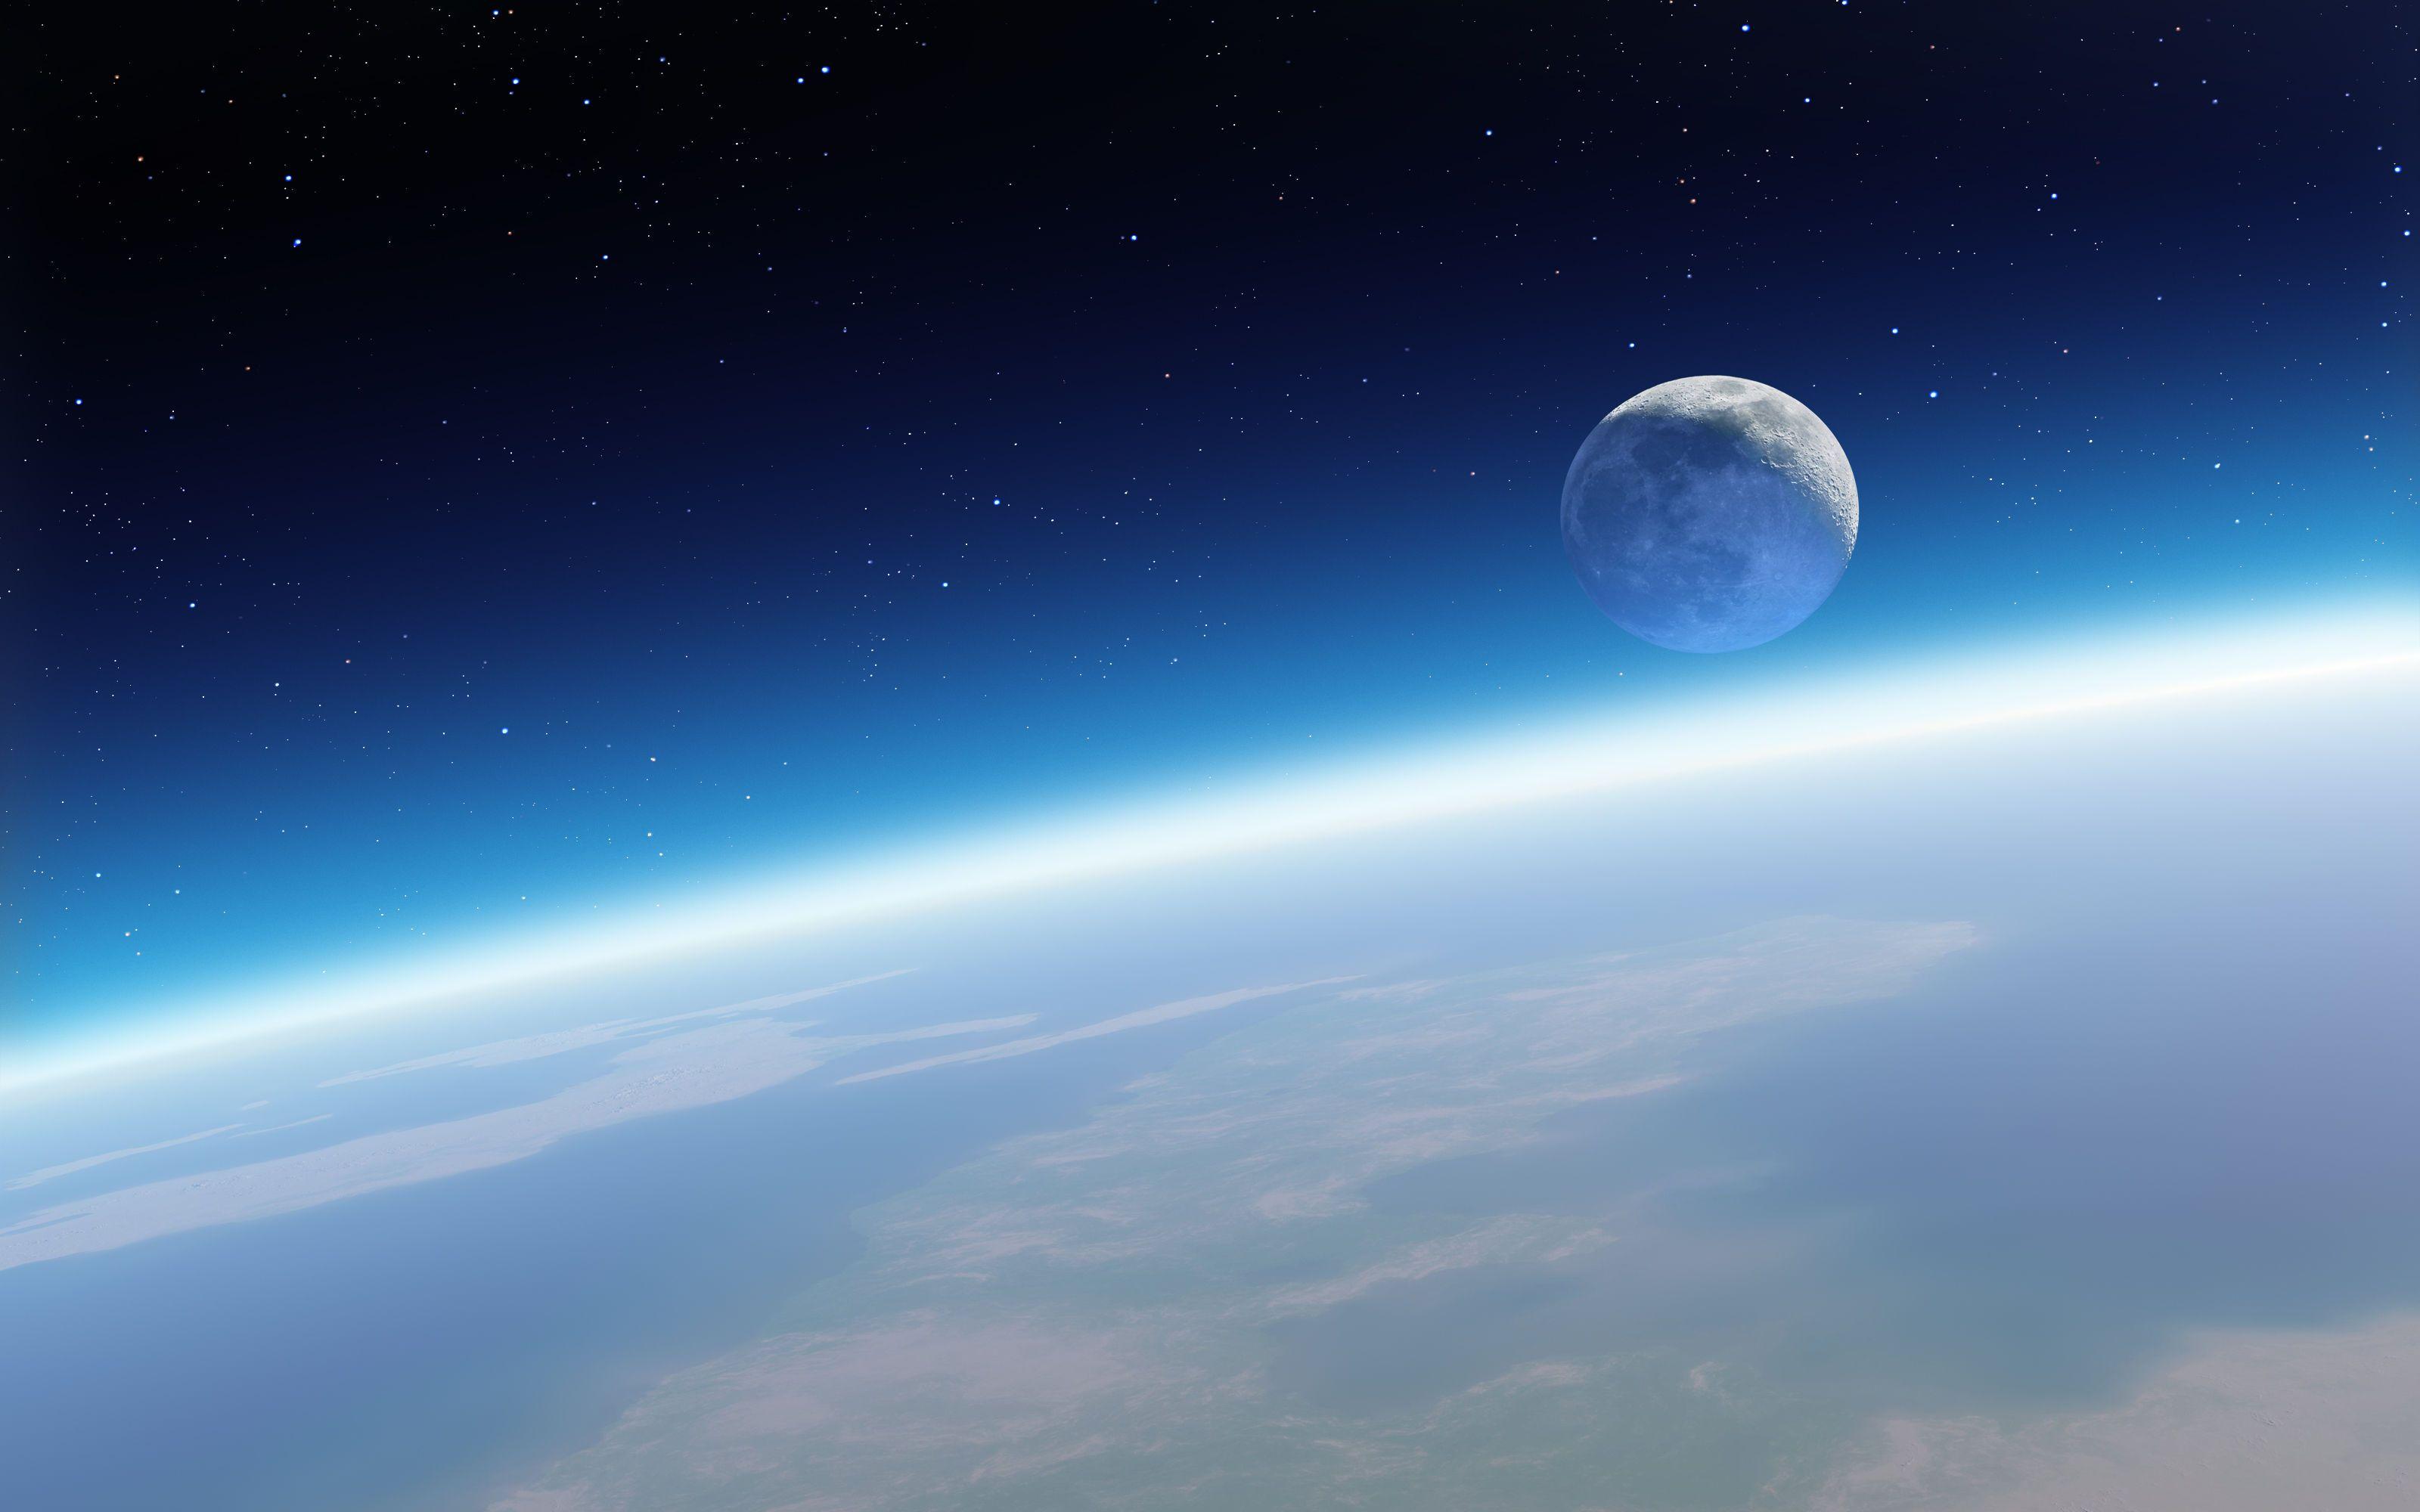 Cosmos Screensaver Mac Google Search Wallpaper Earth Iphone Wallpaper Earth Digital Wallpaper